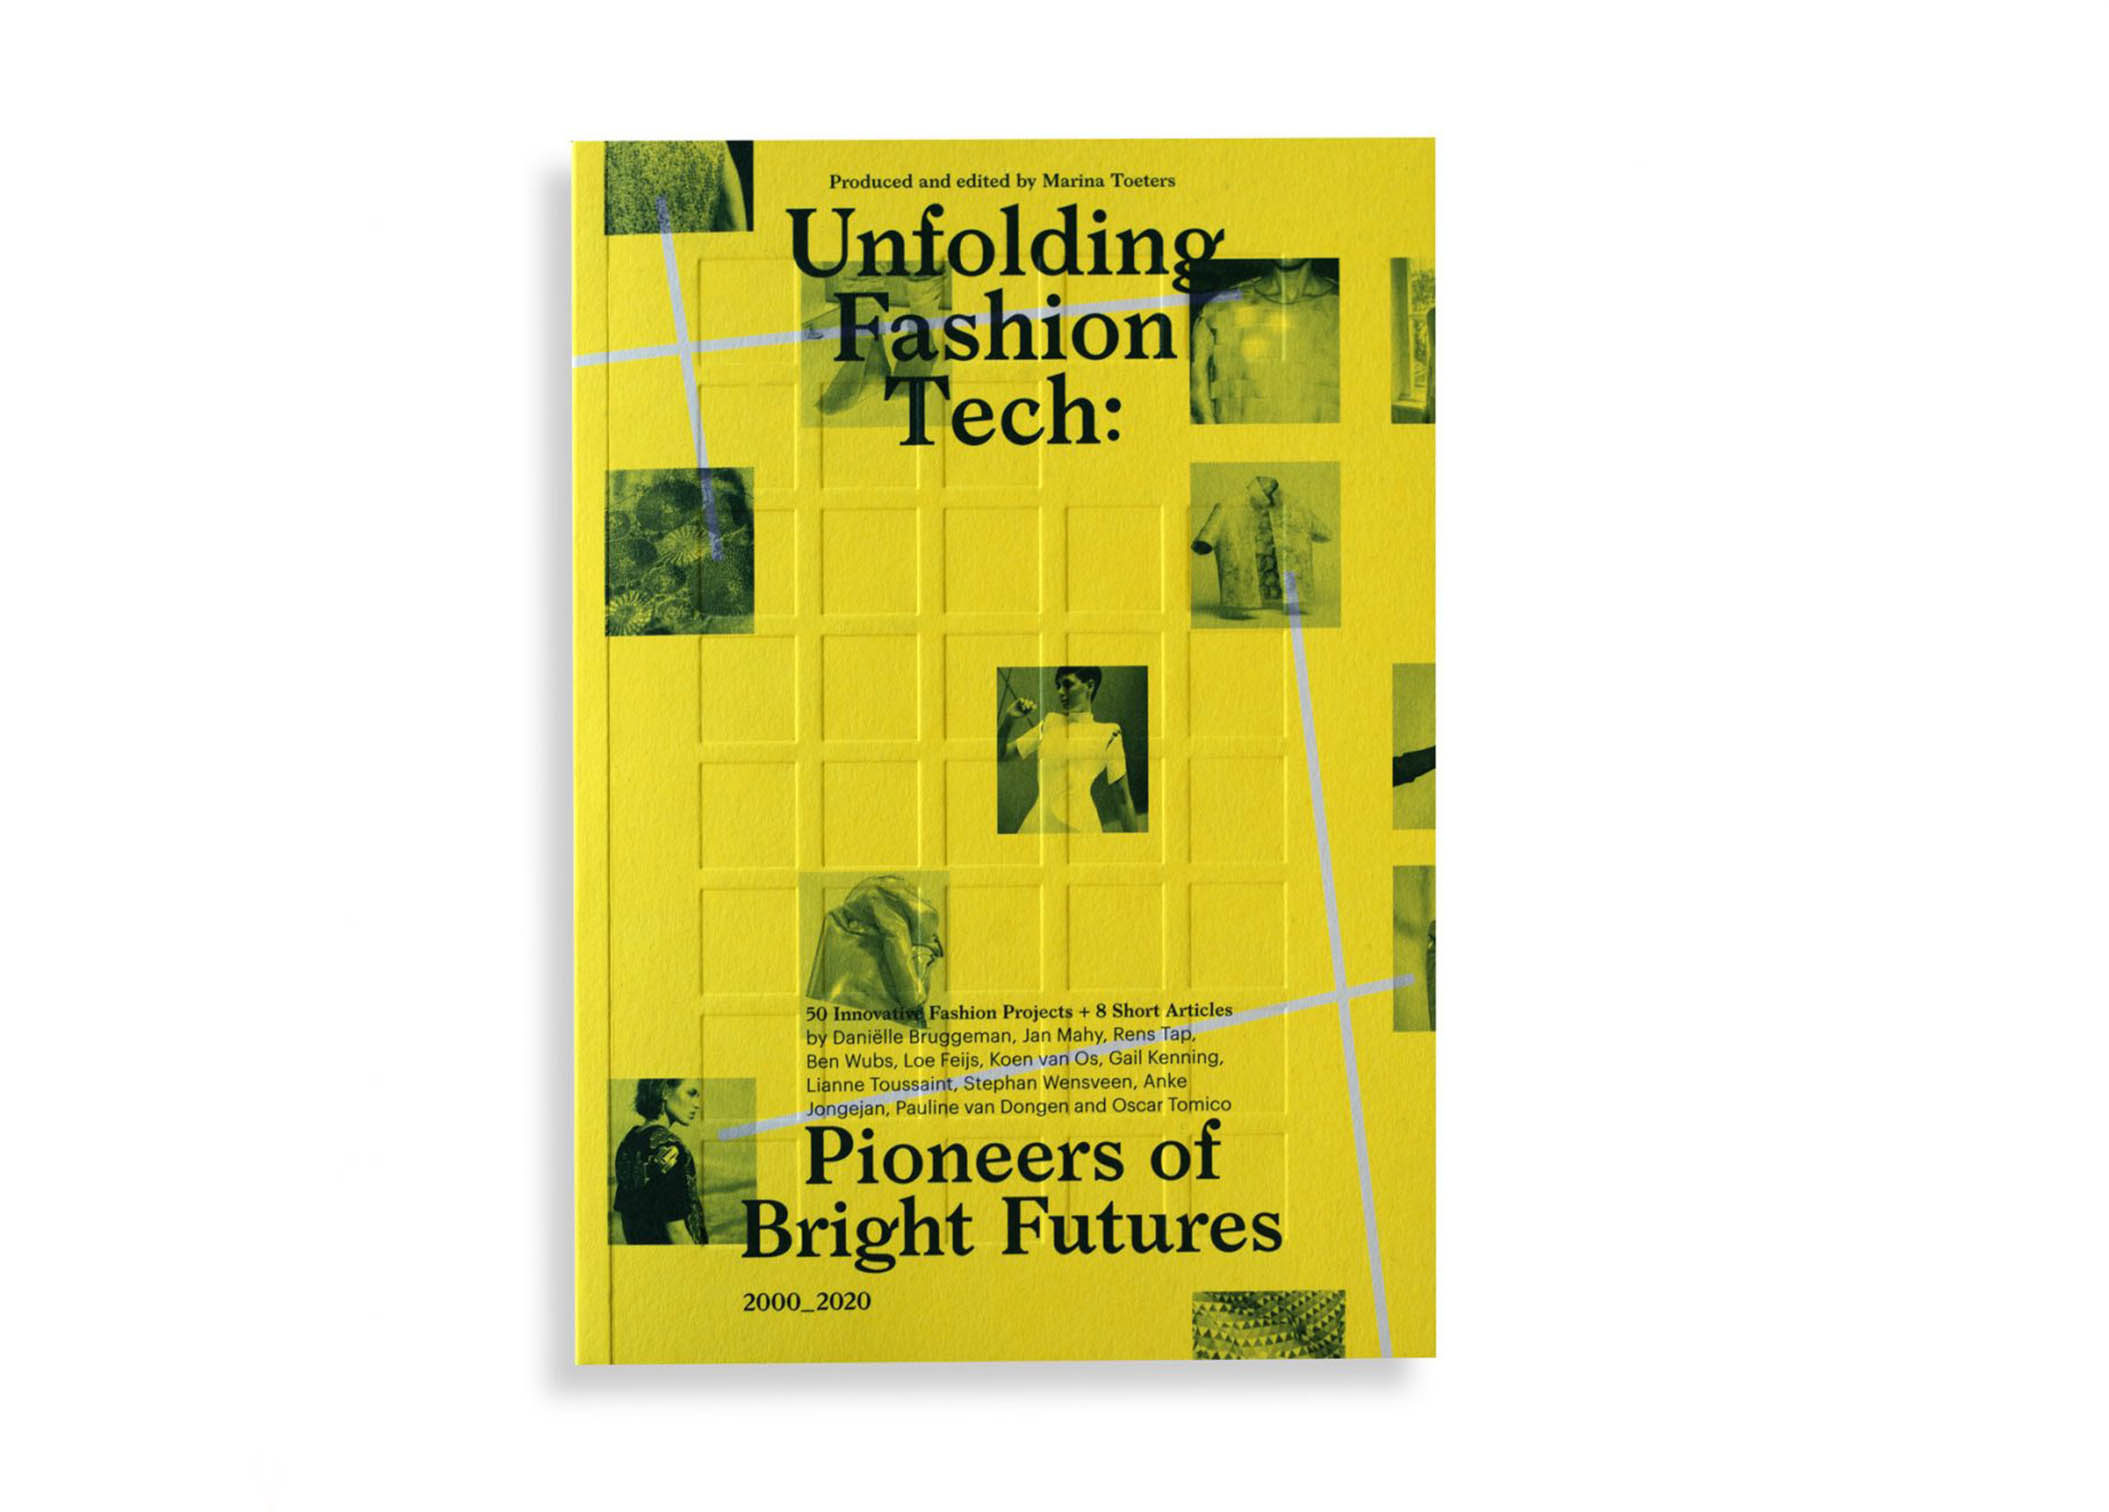 Unfolding Fashion Tech